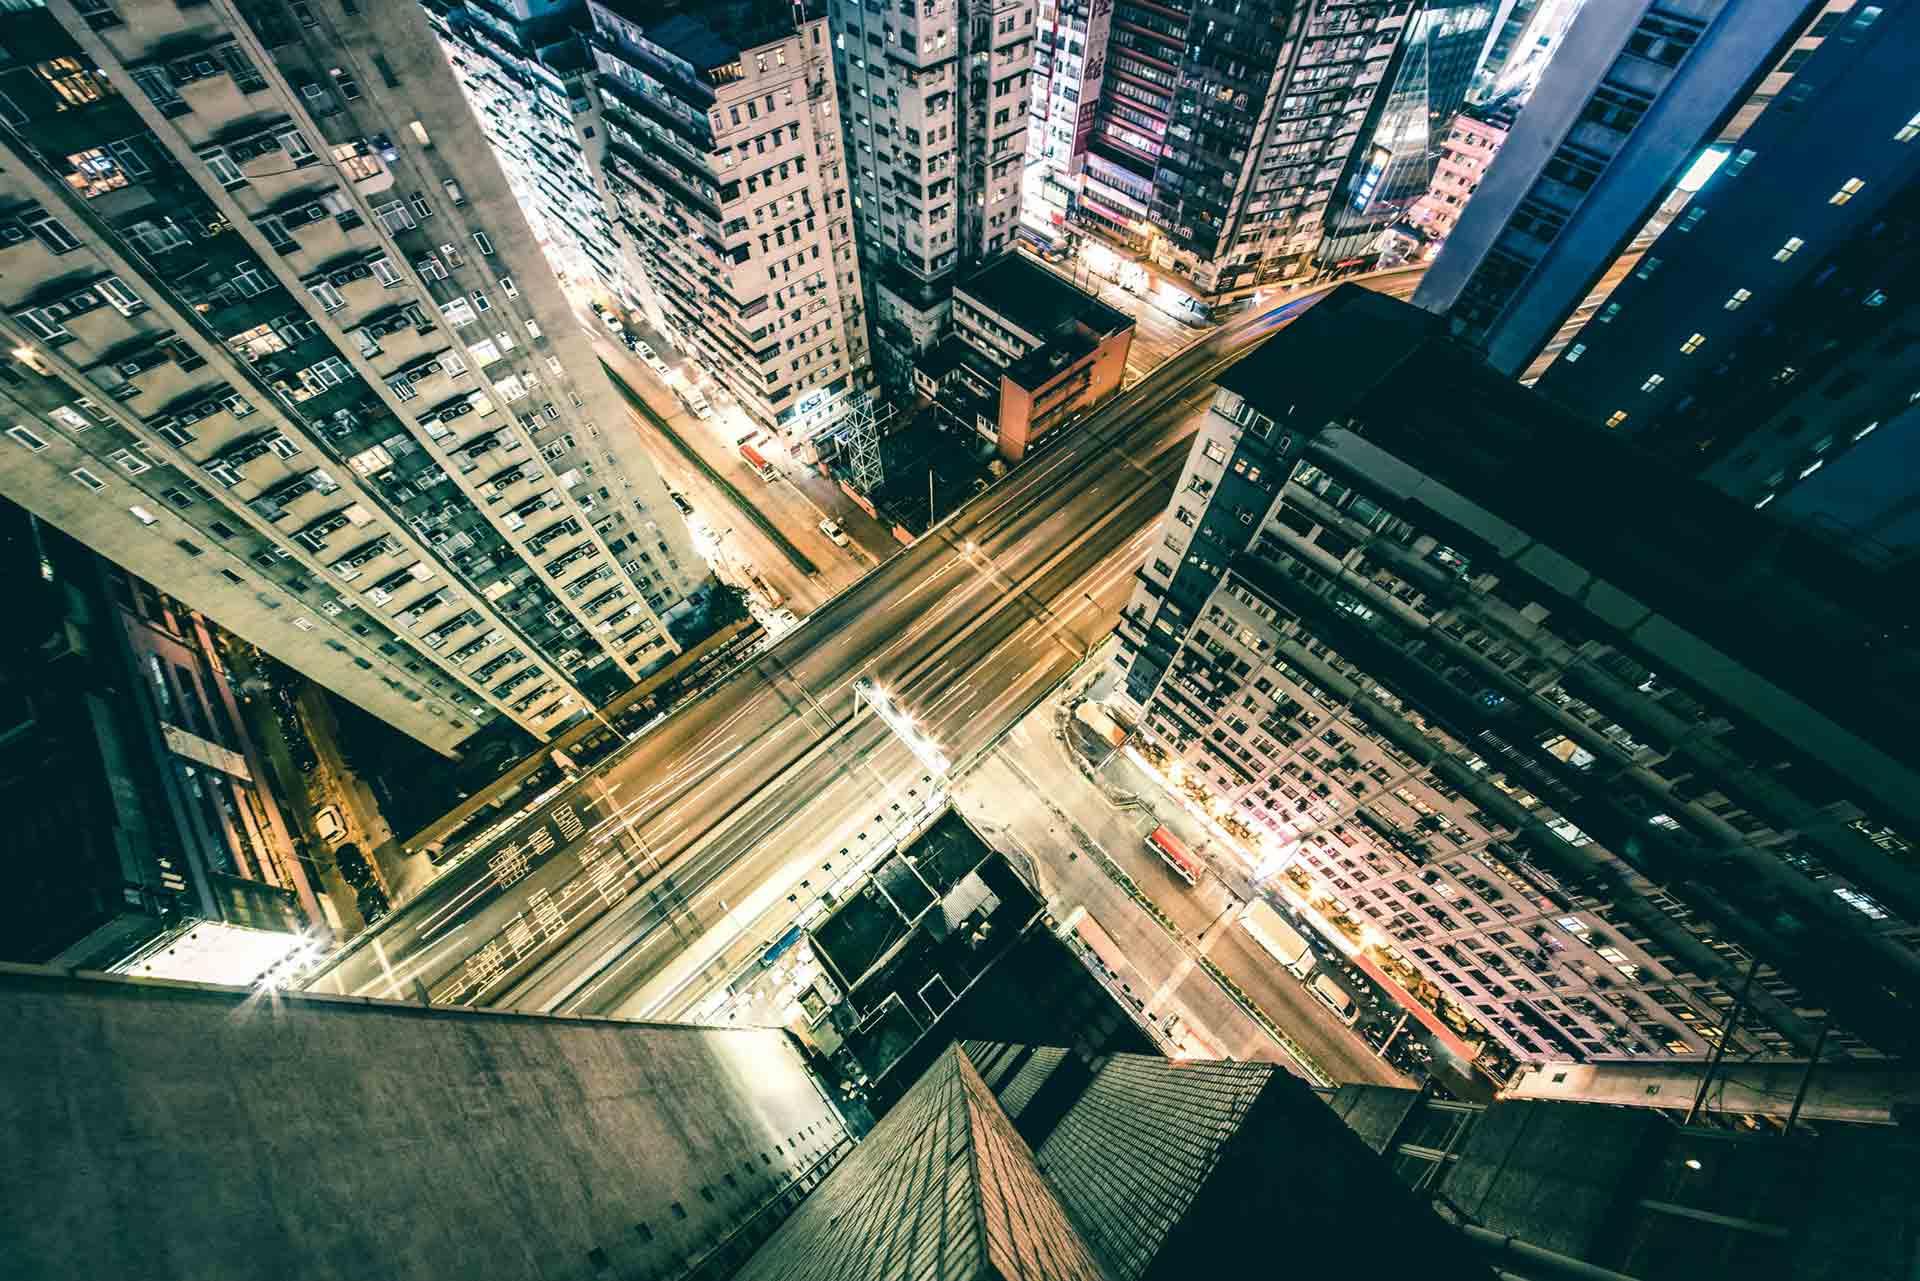 city-streets-optimized.jpg